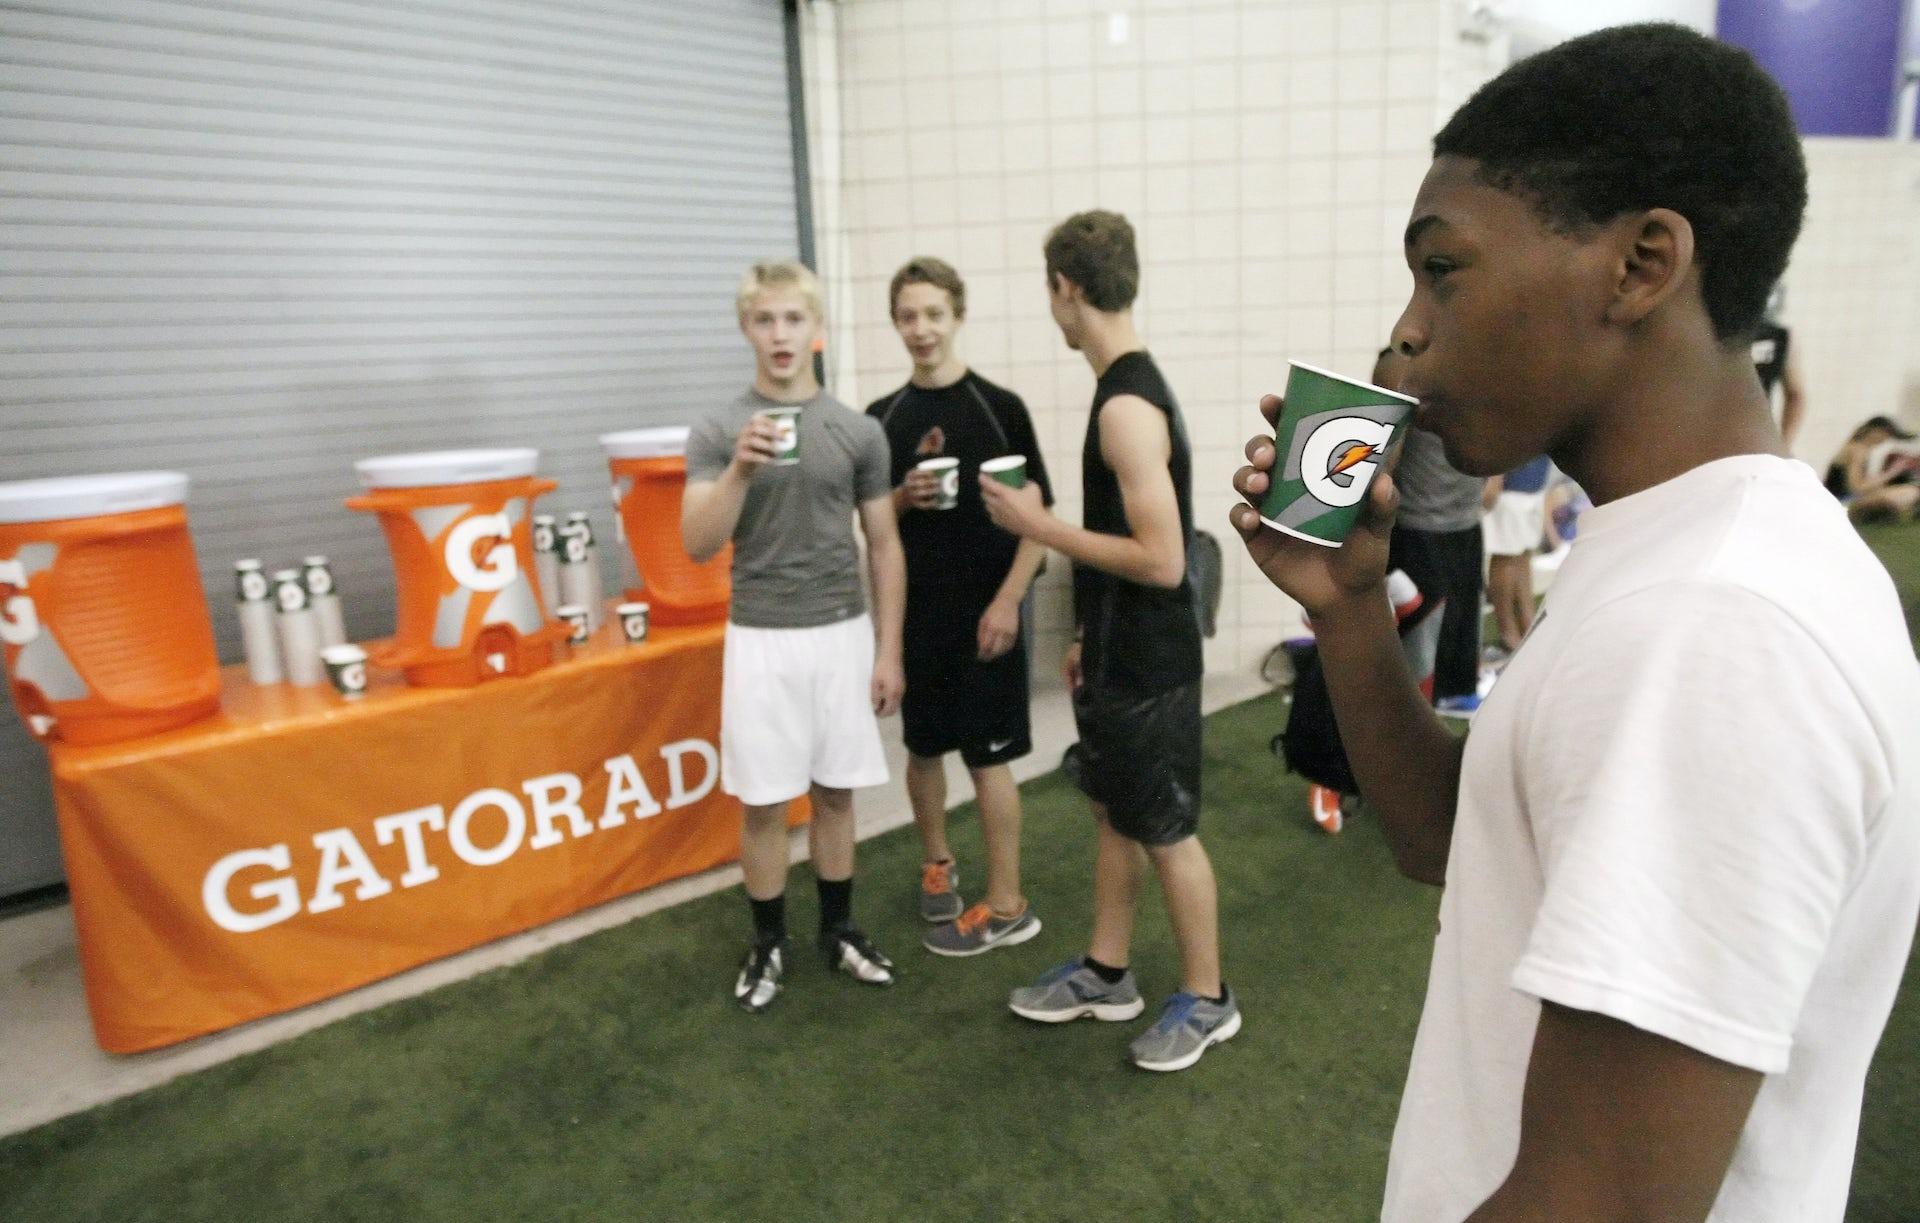 Young athletes drinking Gatorade